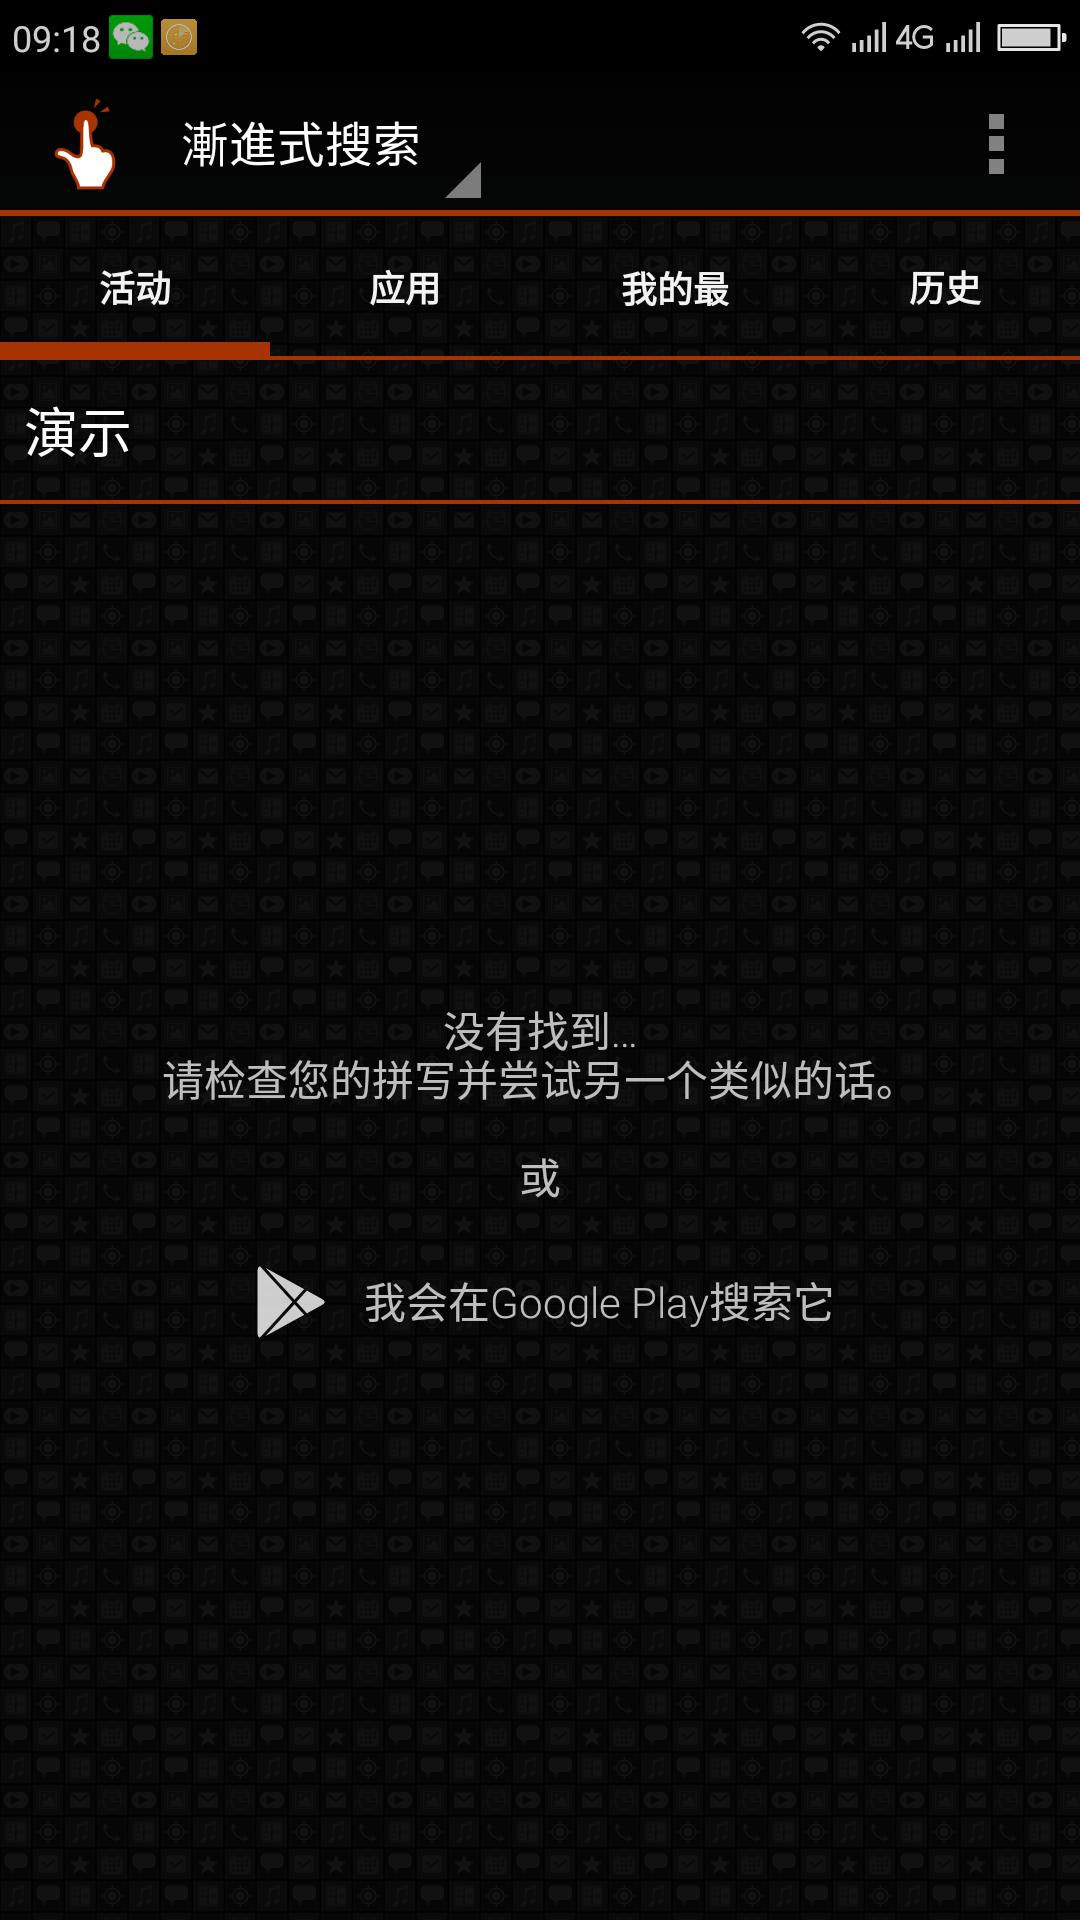 Screenshot_2018-09-26-09-18-58.png